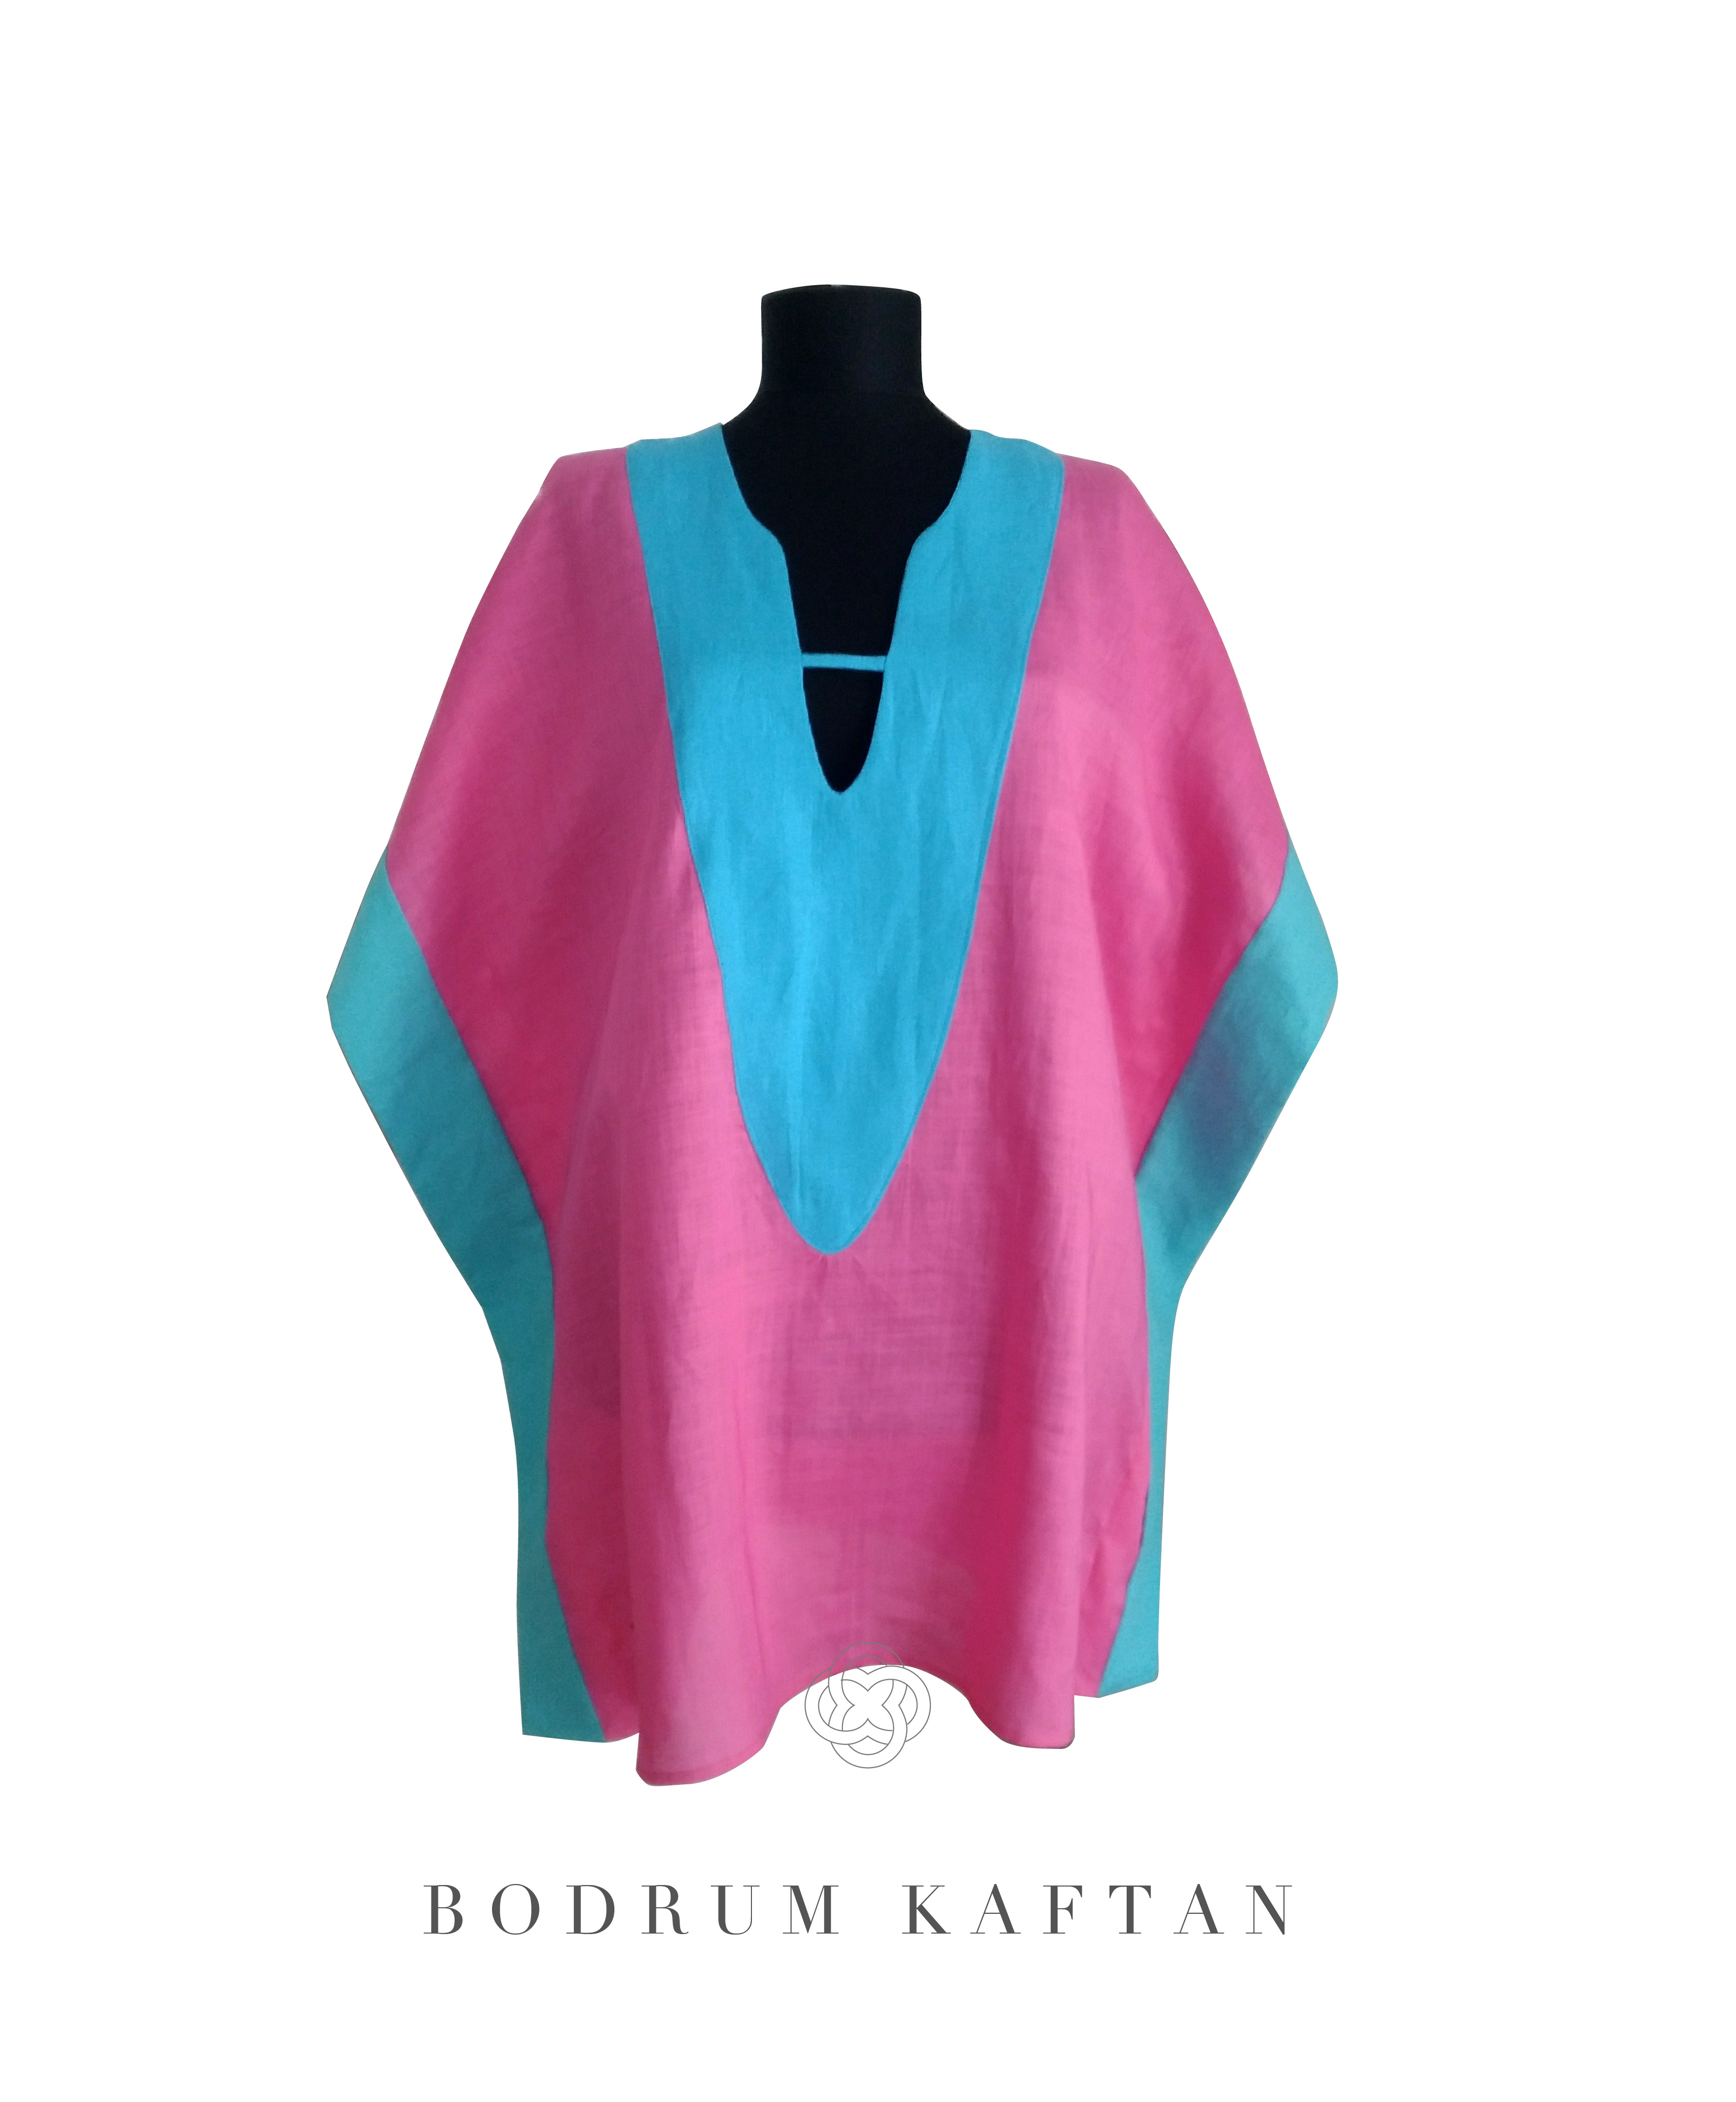 Bodrum Resort Kaftan Tunic Linen Capri ボドルムリゾートカフタンチュニック丈 リネン カプリ